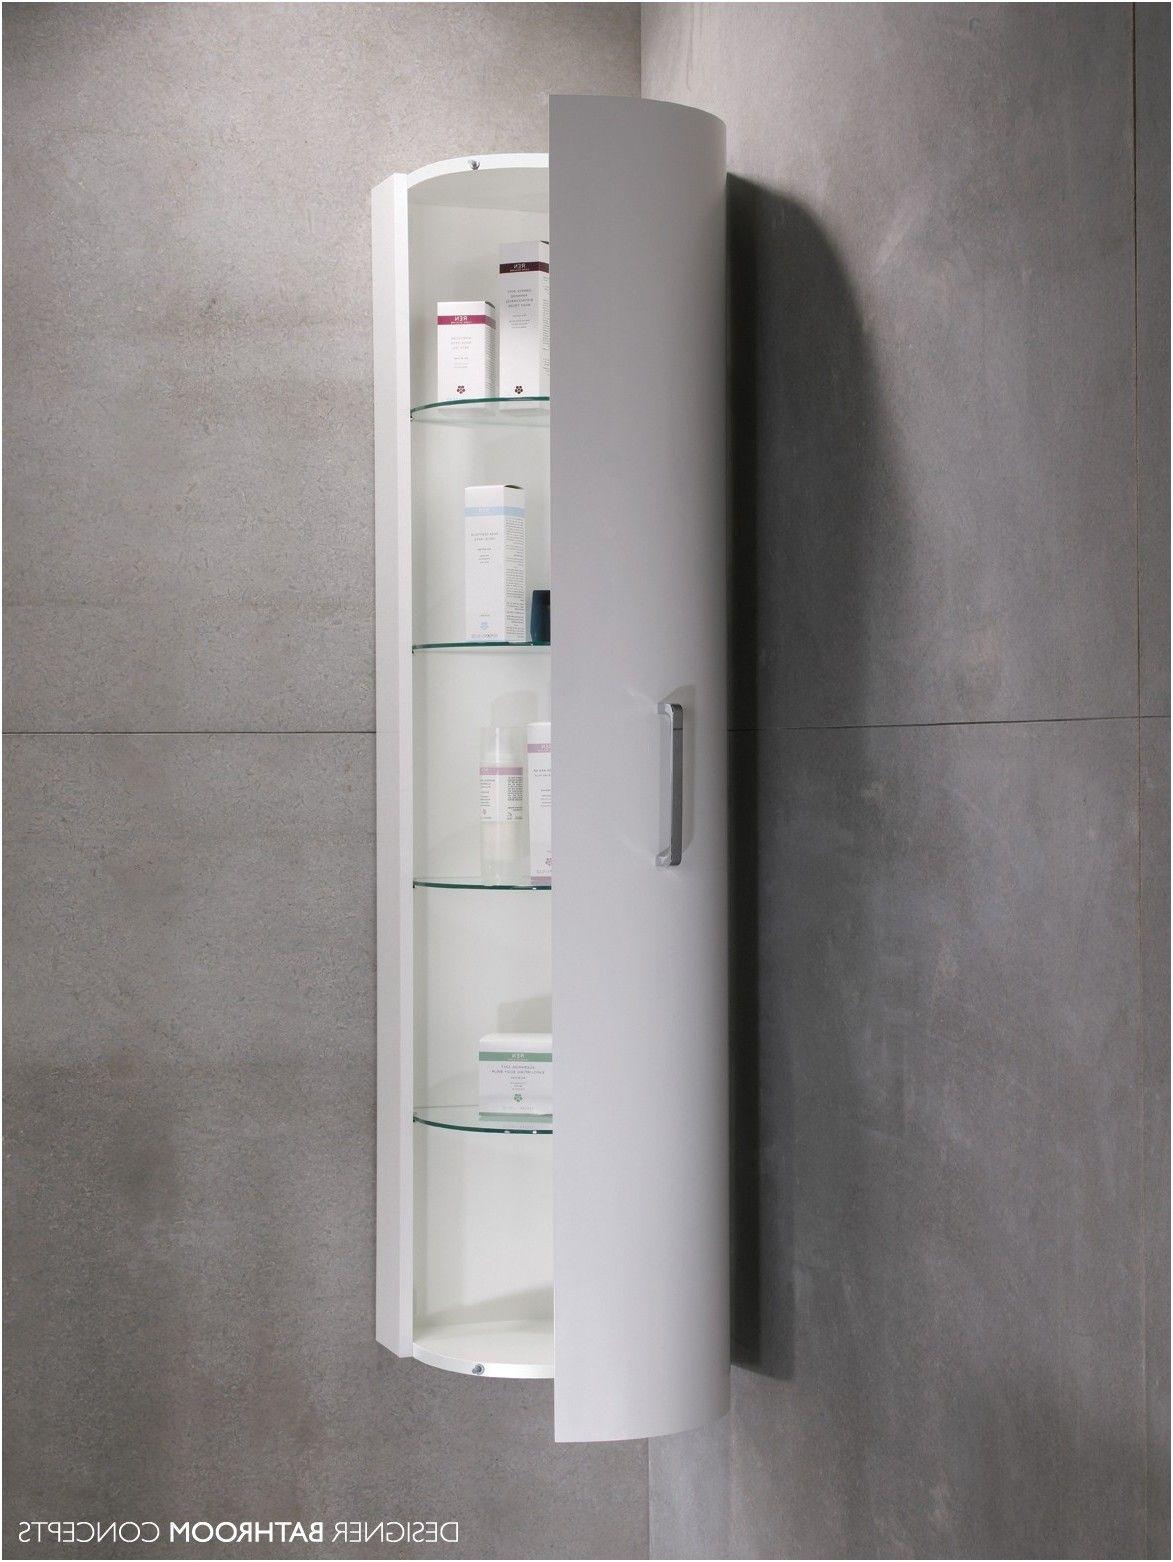 High cabinet for bathroom - Bathroom Lowes Bathroom Cabinets Wall Medicine Cabinet Ikea From White High Gloss Bathroom Cabinet